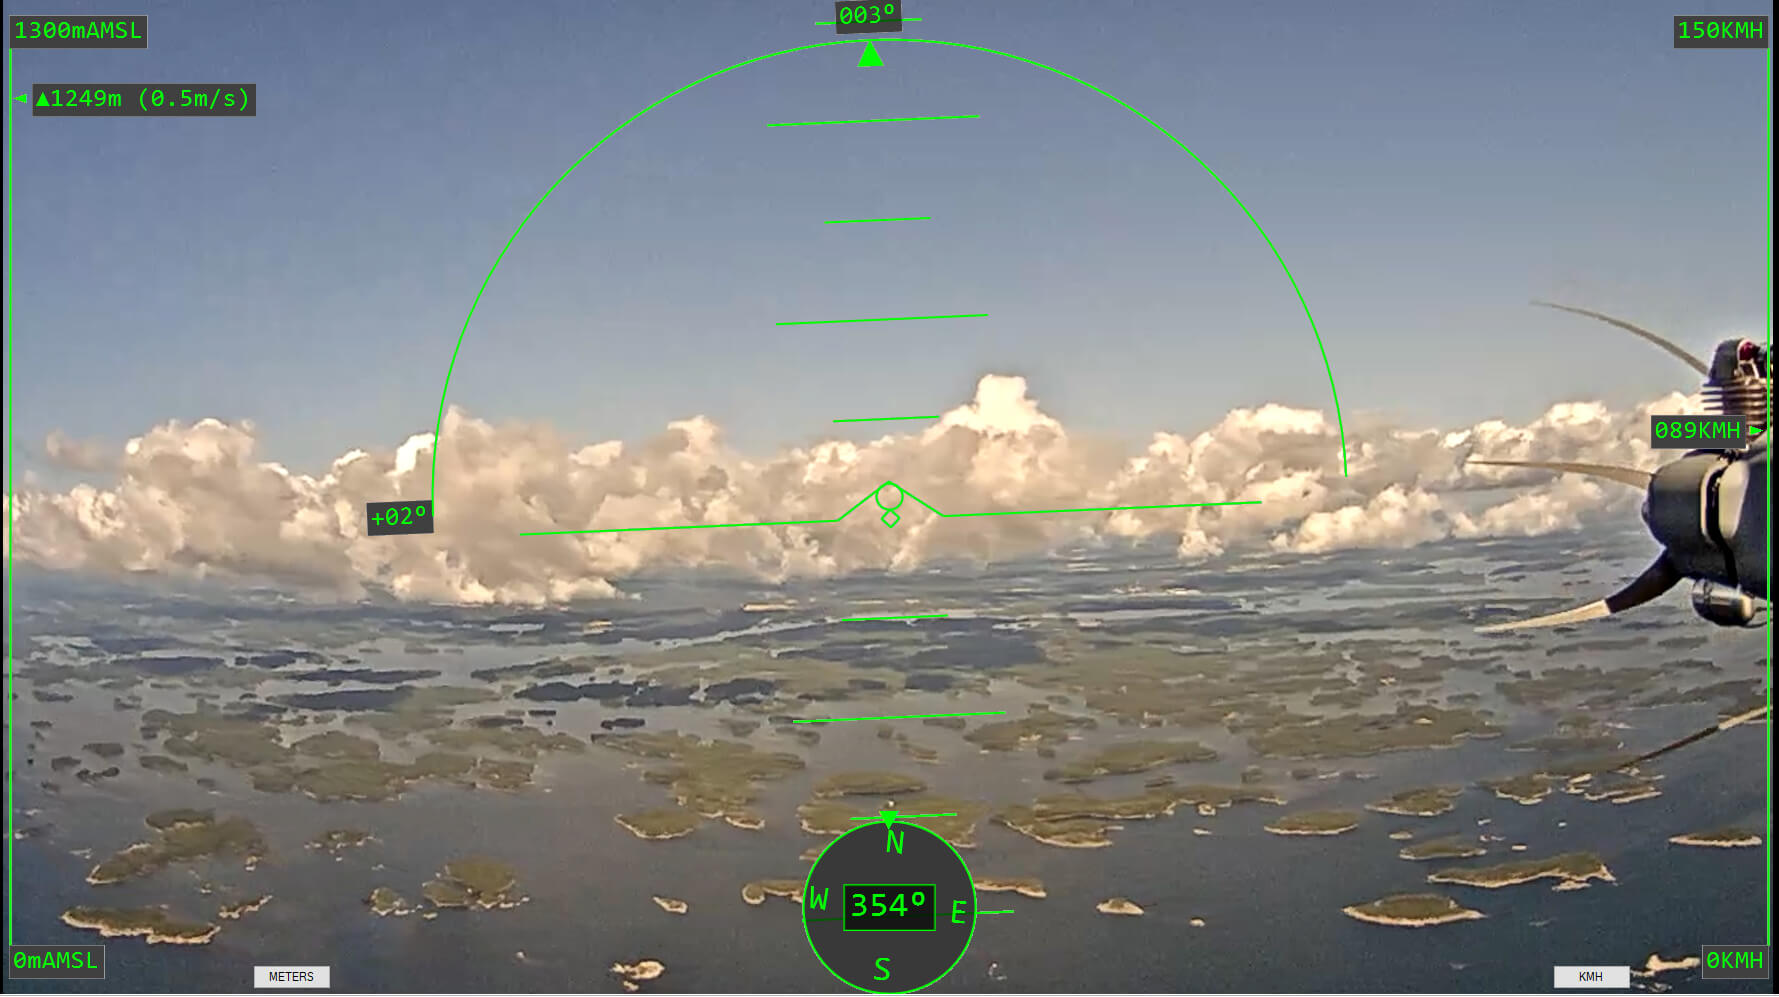 Stream UAV - operator view first drone flight from Estonia to Finland